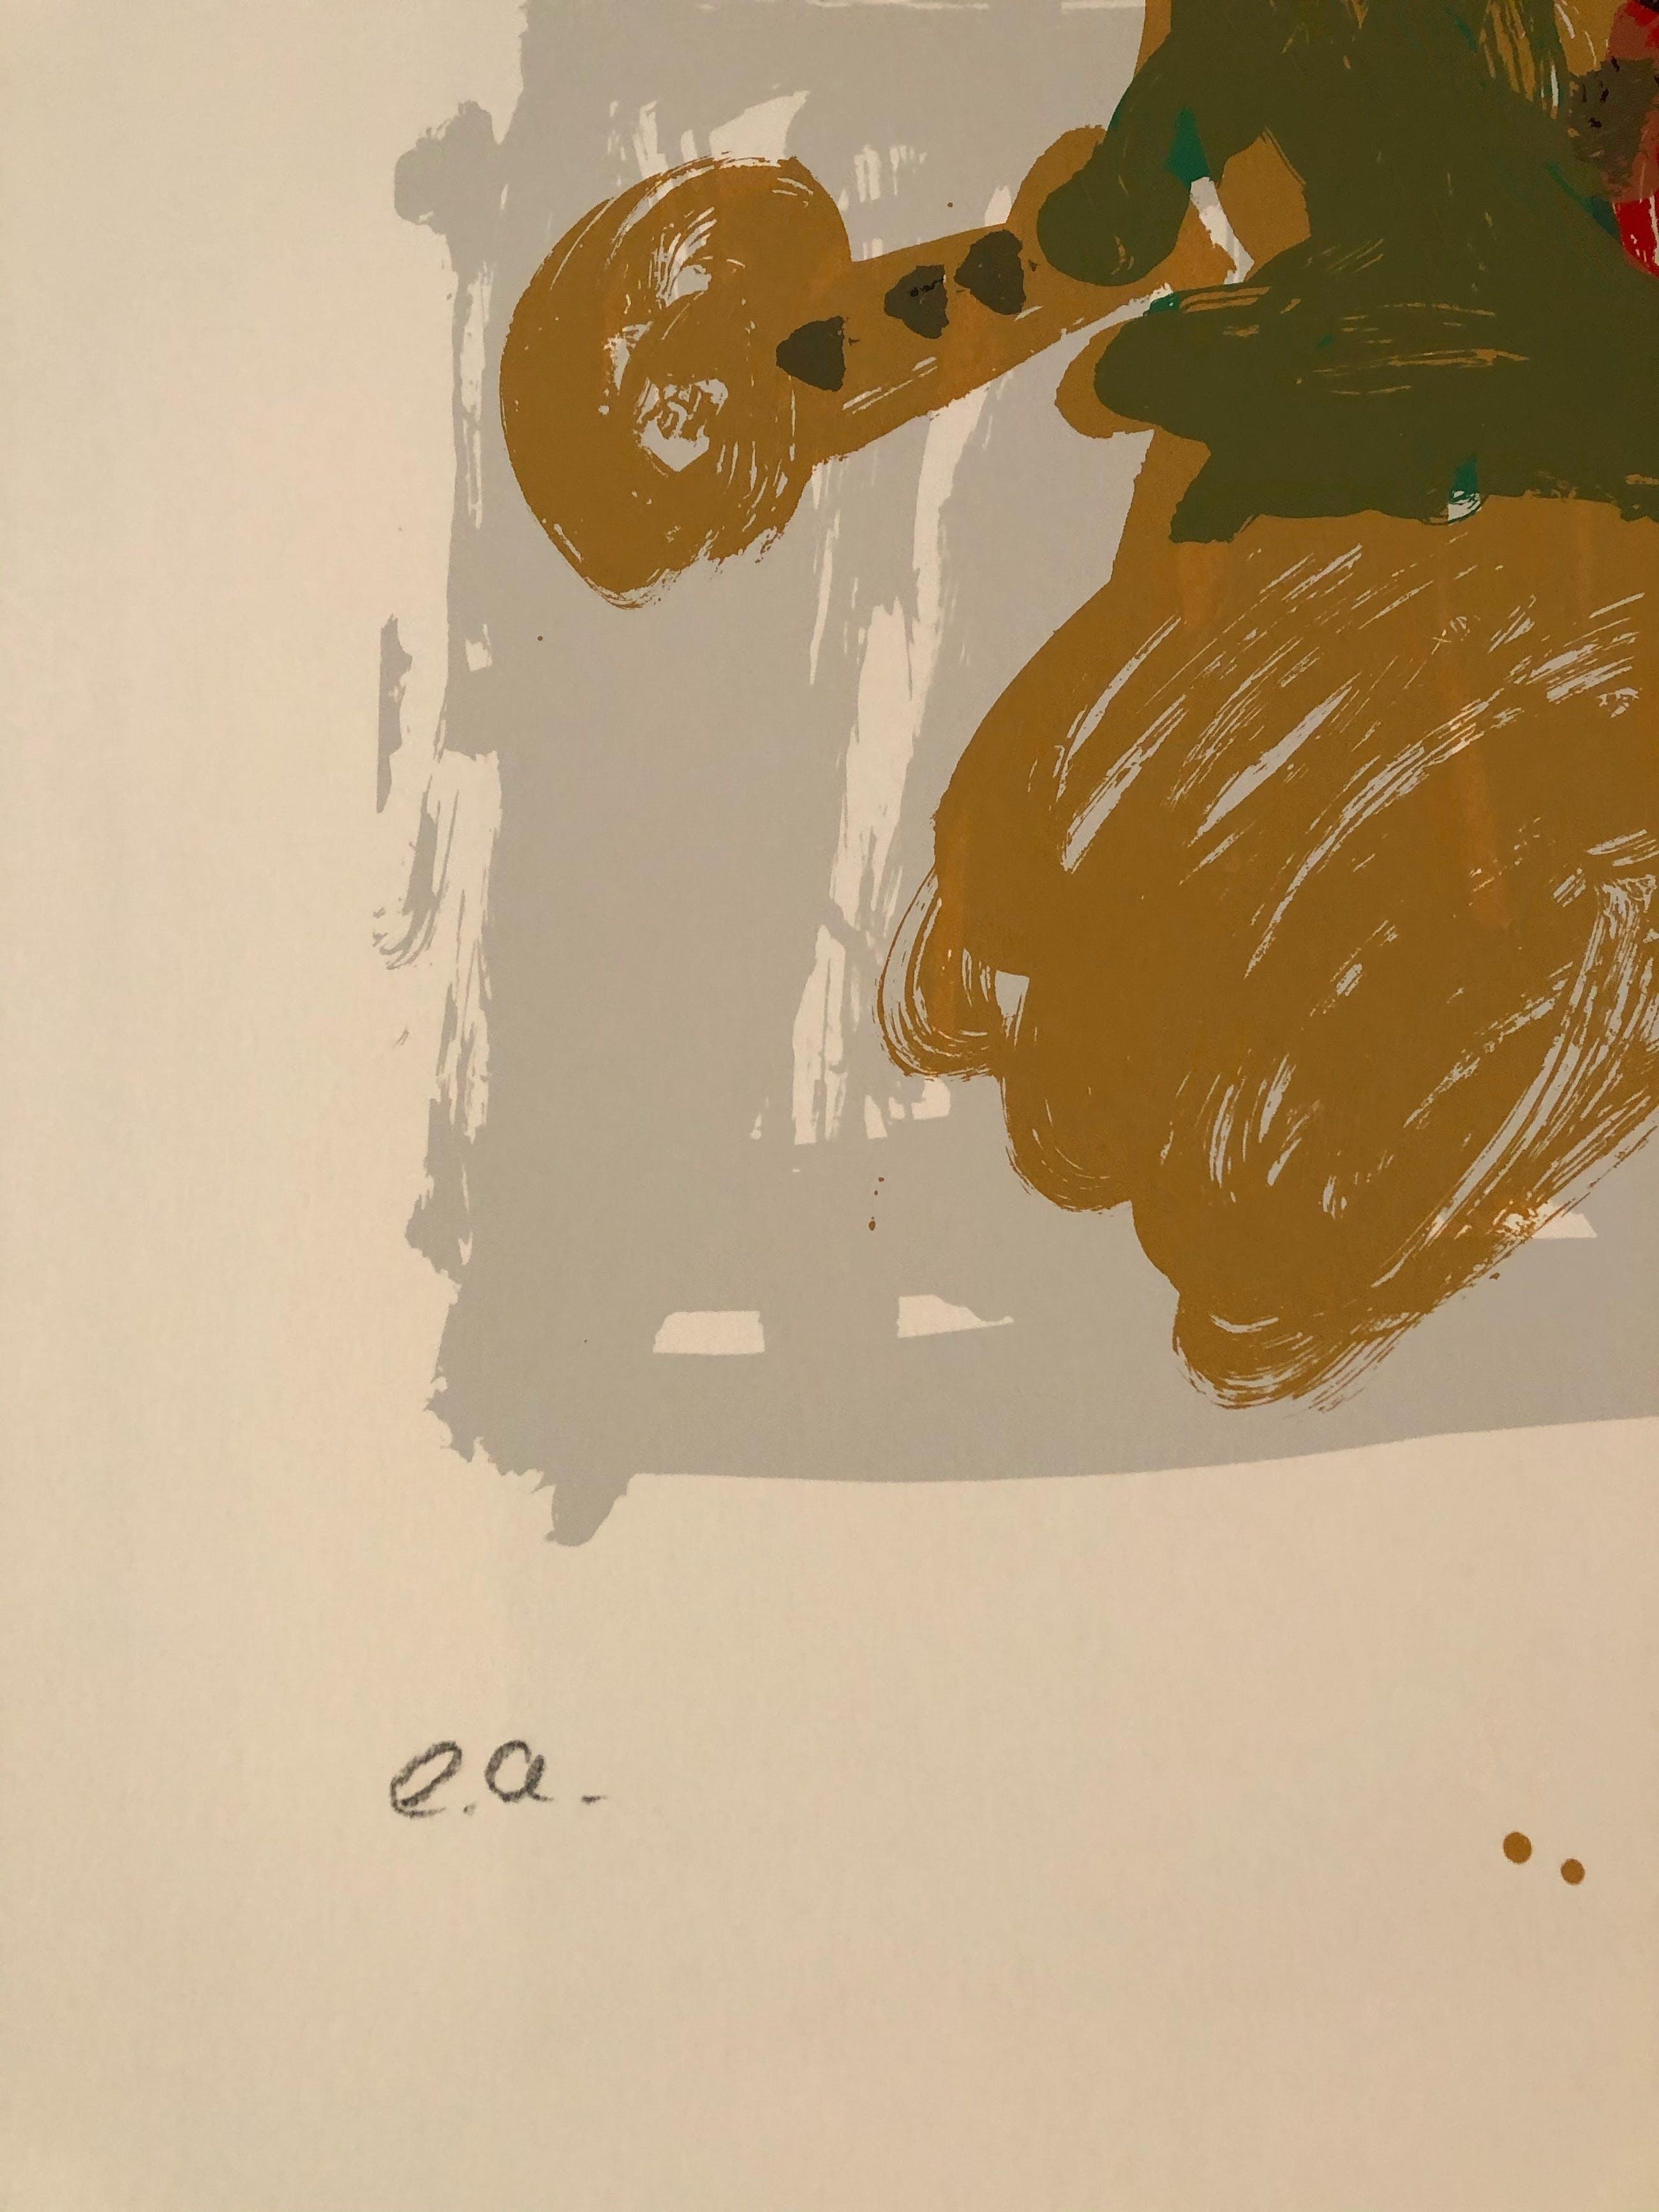 Markus Lüpertz - schöner Siebdruck, handsign.e.a.-Exemplar kopen? Bied vanaf 360!